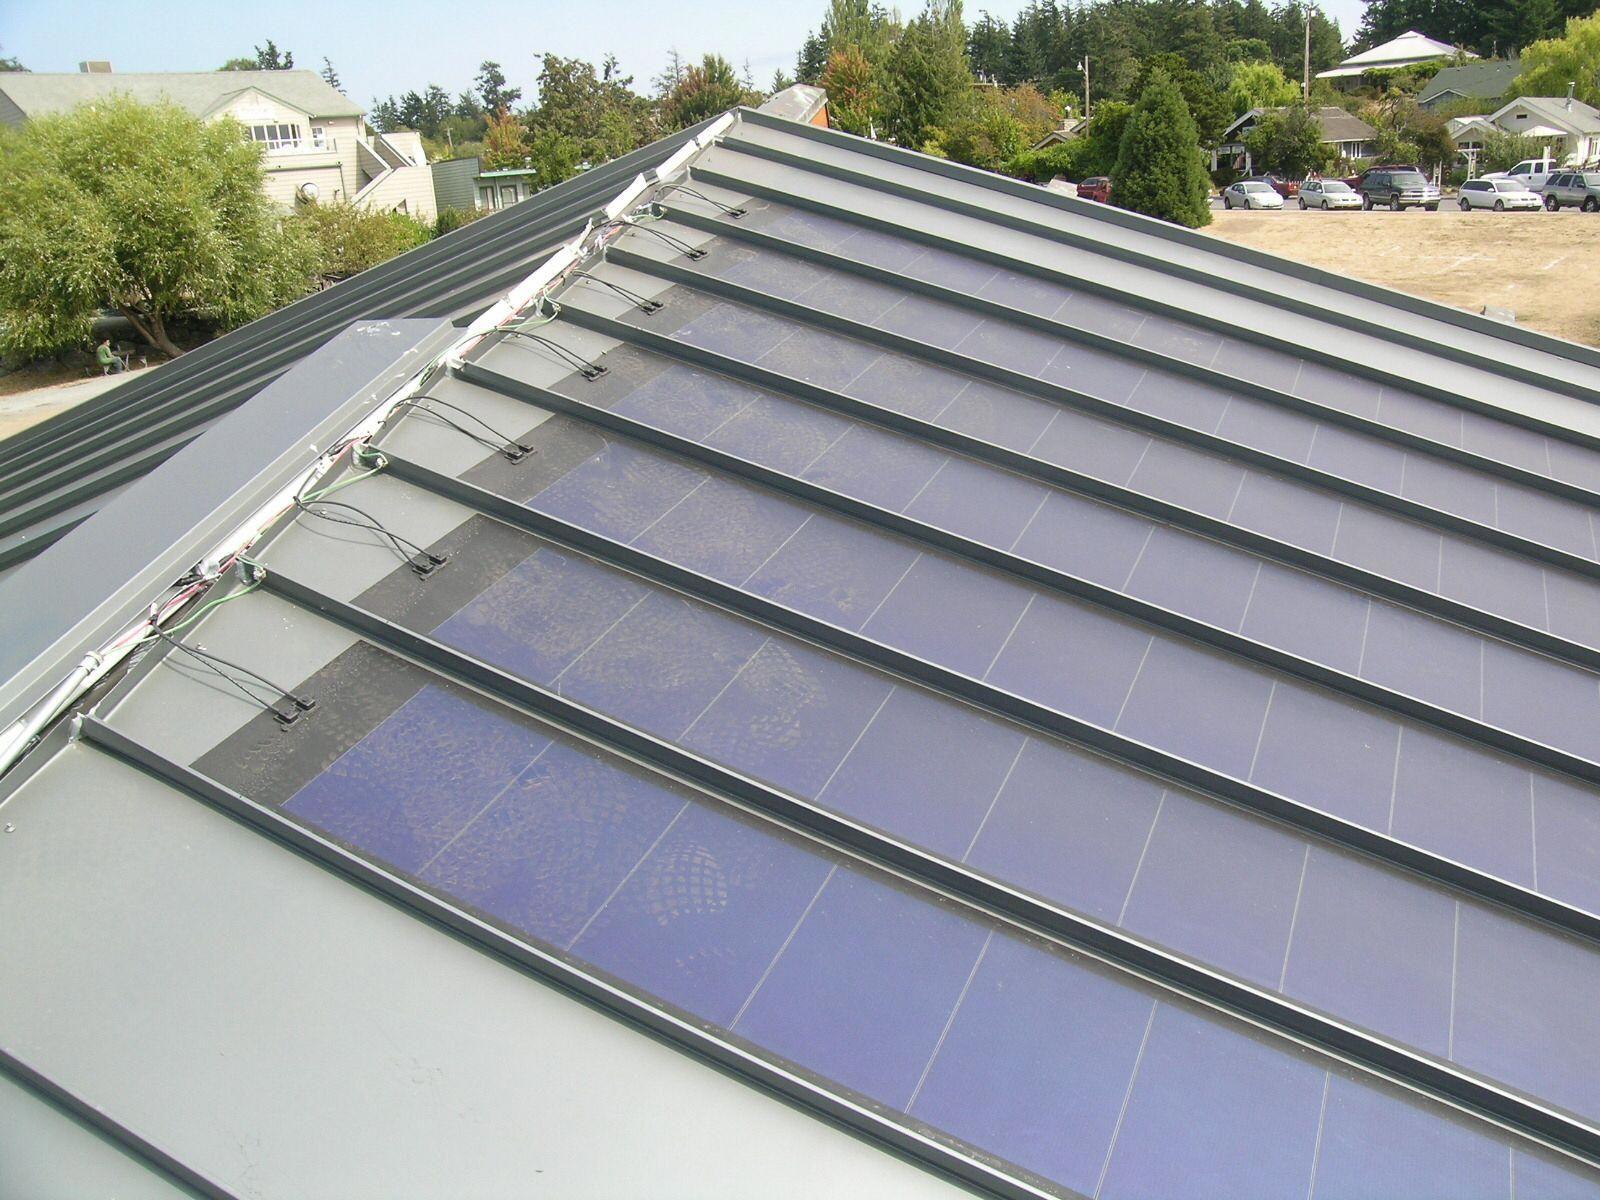 Solar Panels For Standing Seam Metal Roof Solarpanels Solarenergy Solarpower Solargenerator Solarpanelki In 2020 Thin Film Solar Panels Solar Panels Best Solar Panels